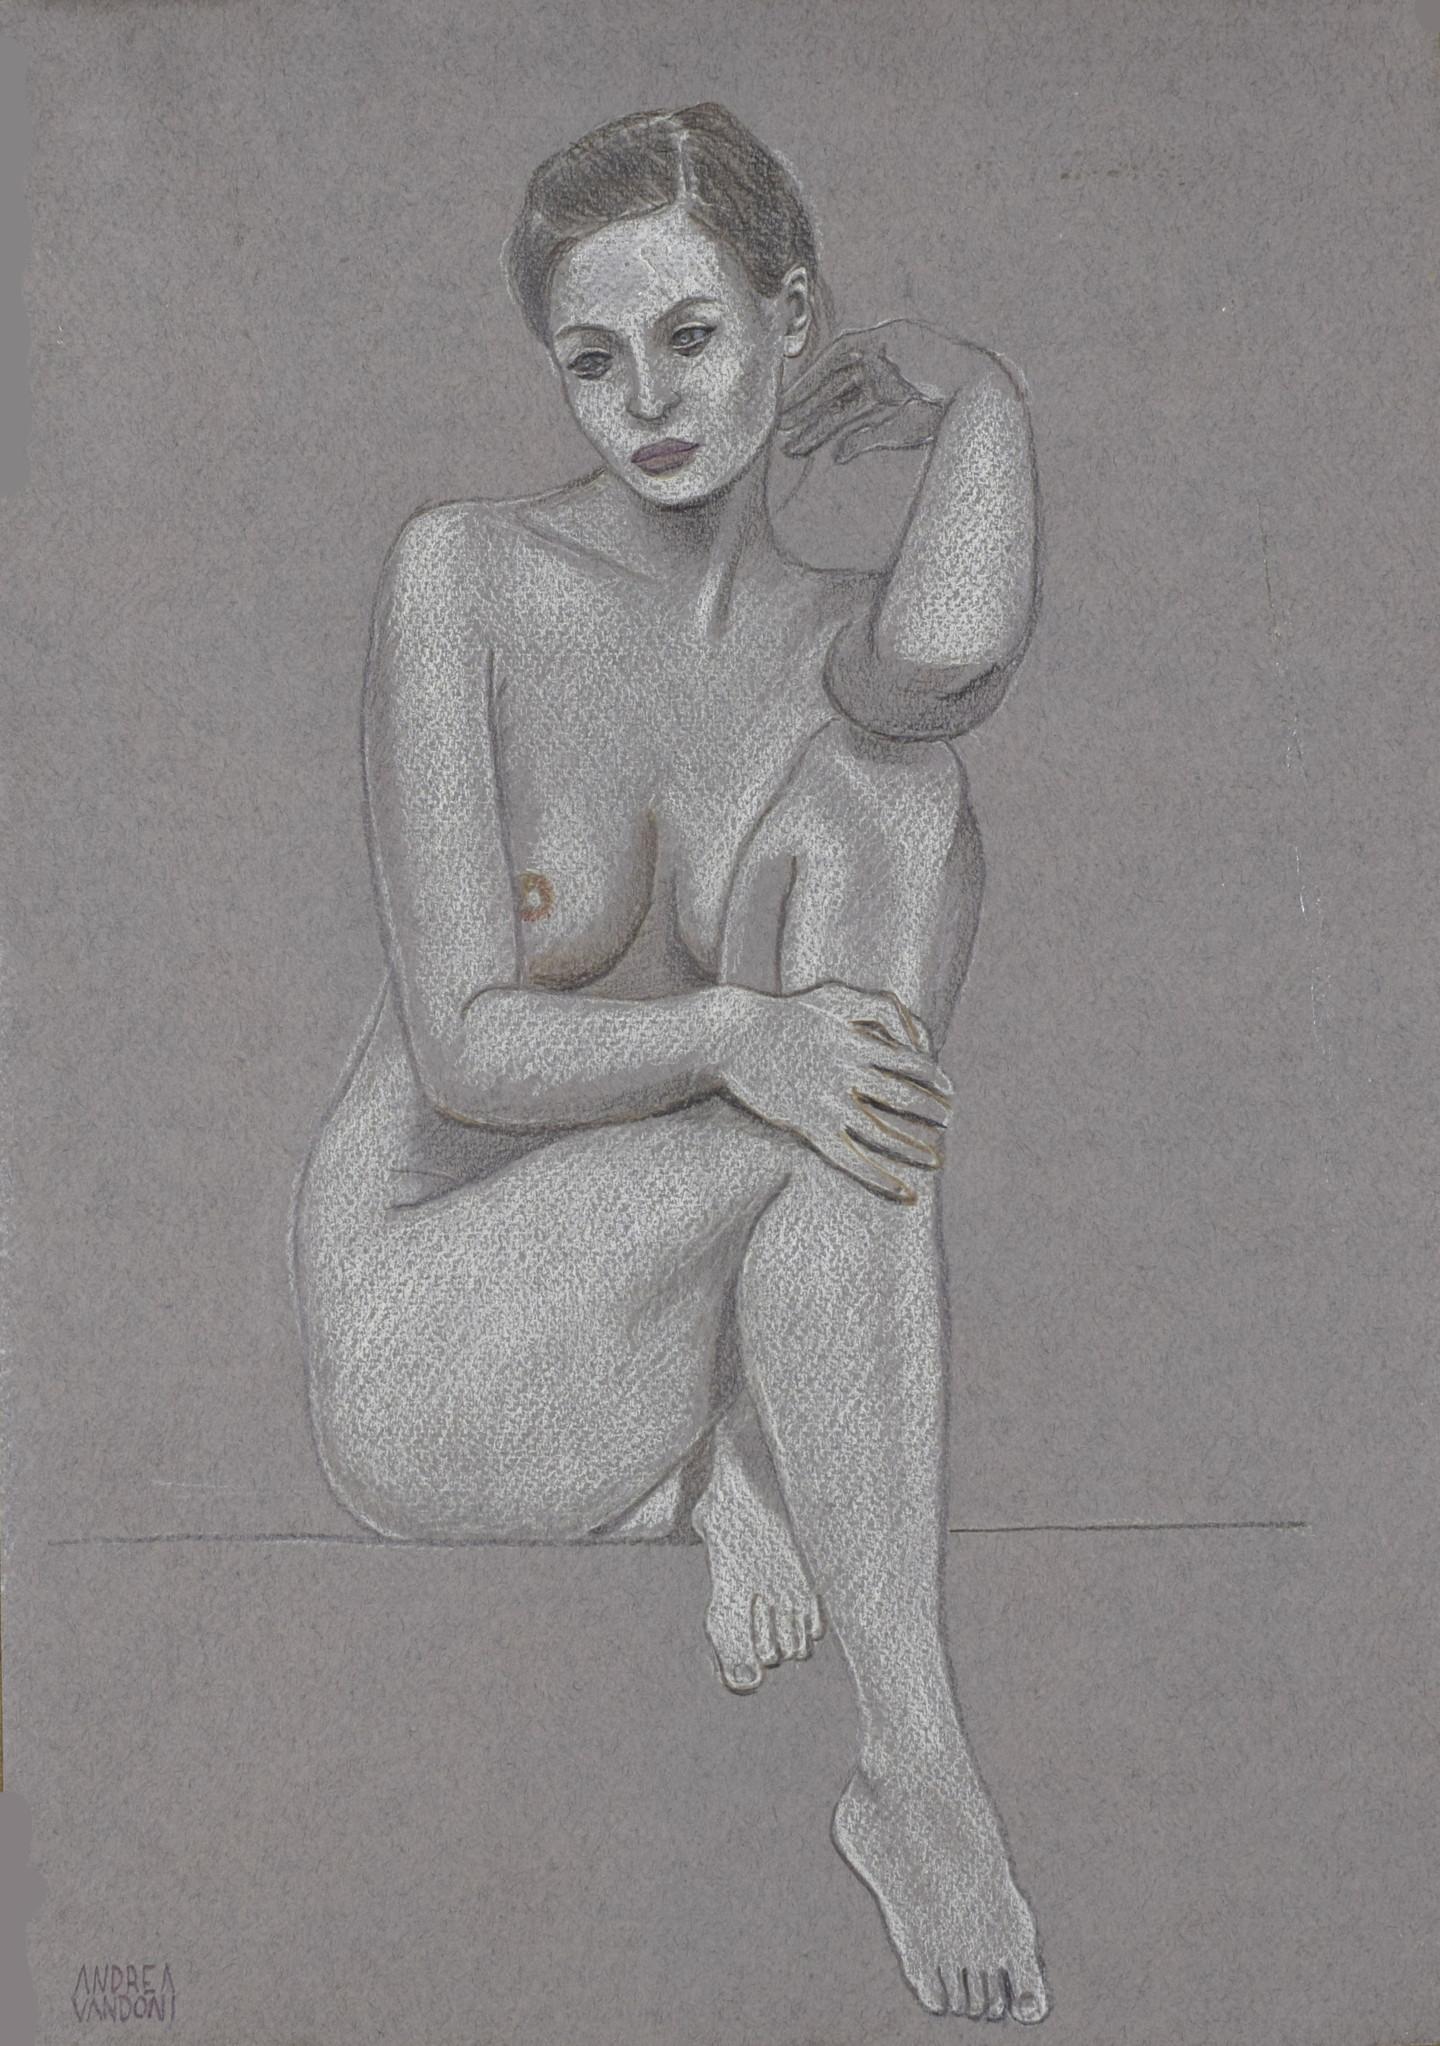 Andrea Vandoni - NUDE